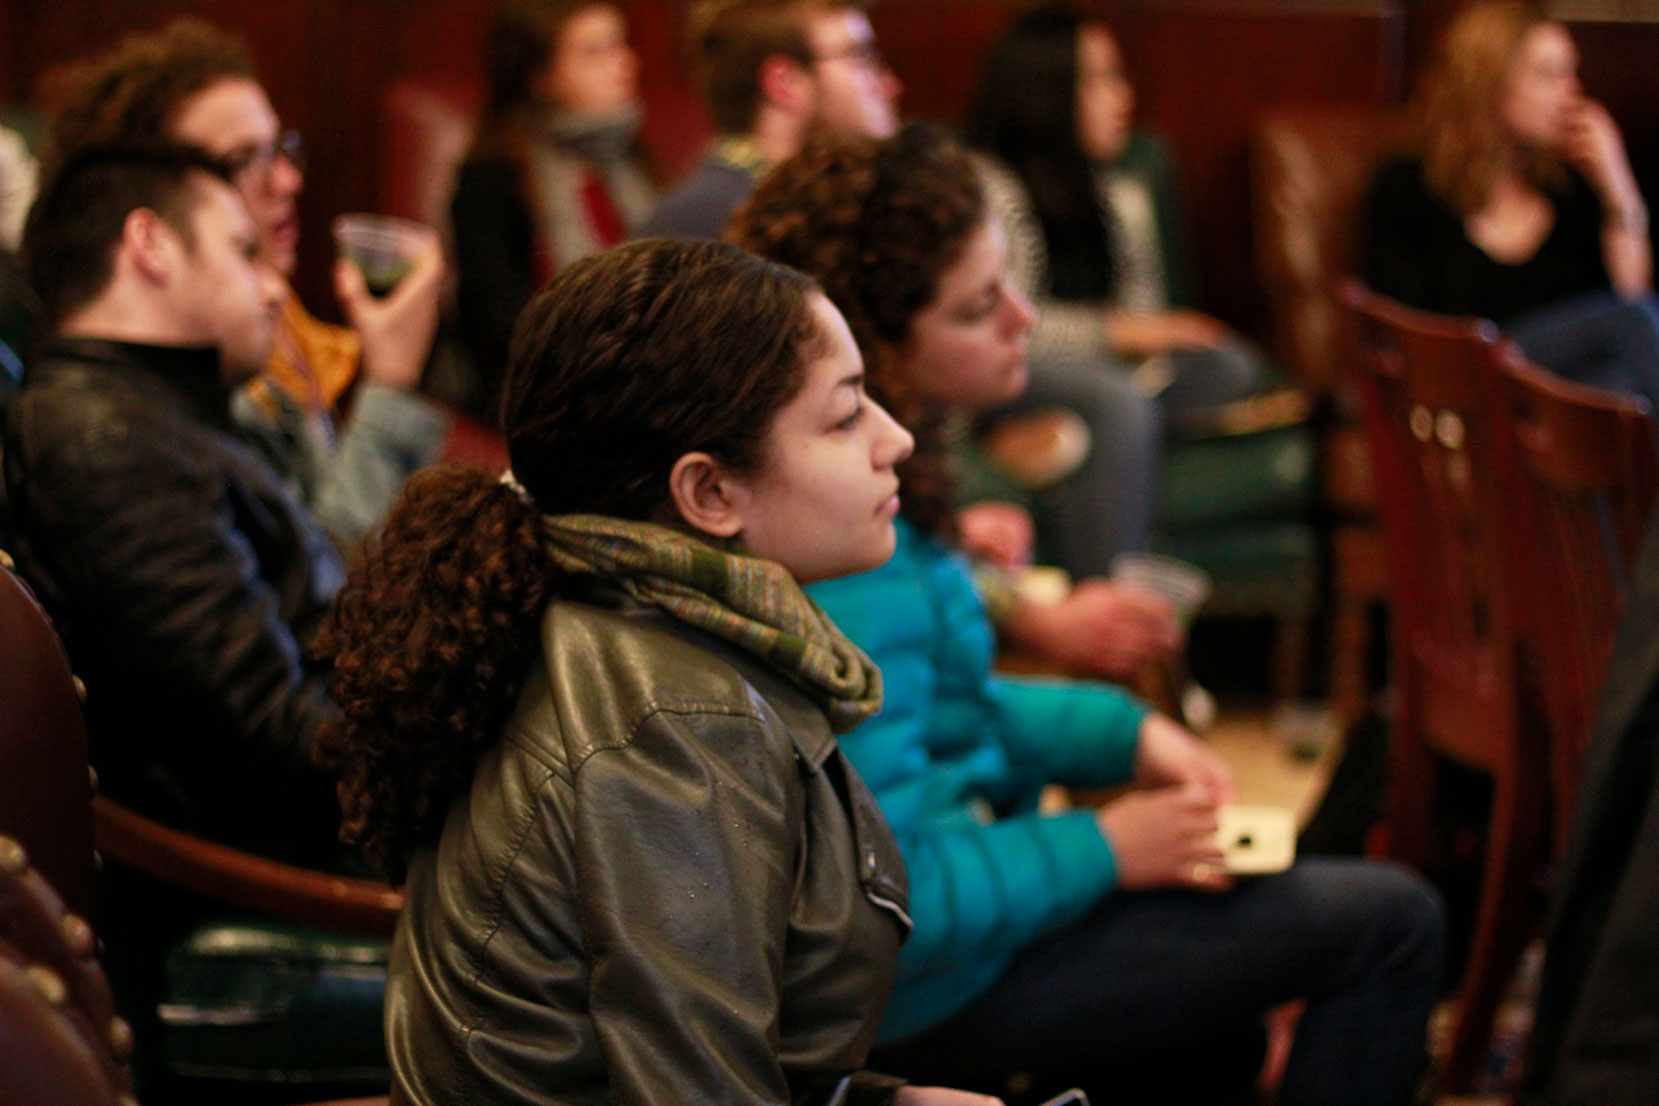 surbhi_mellon_forum_audience.jpg